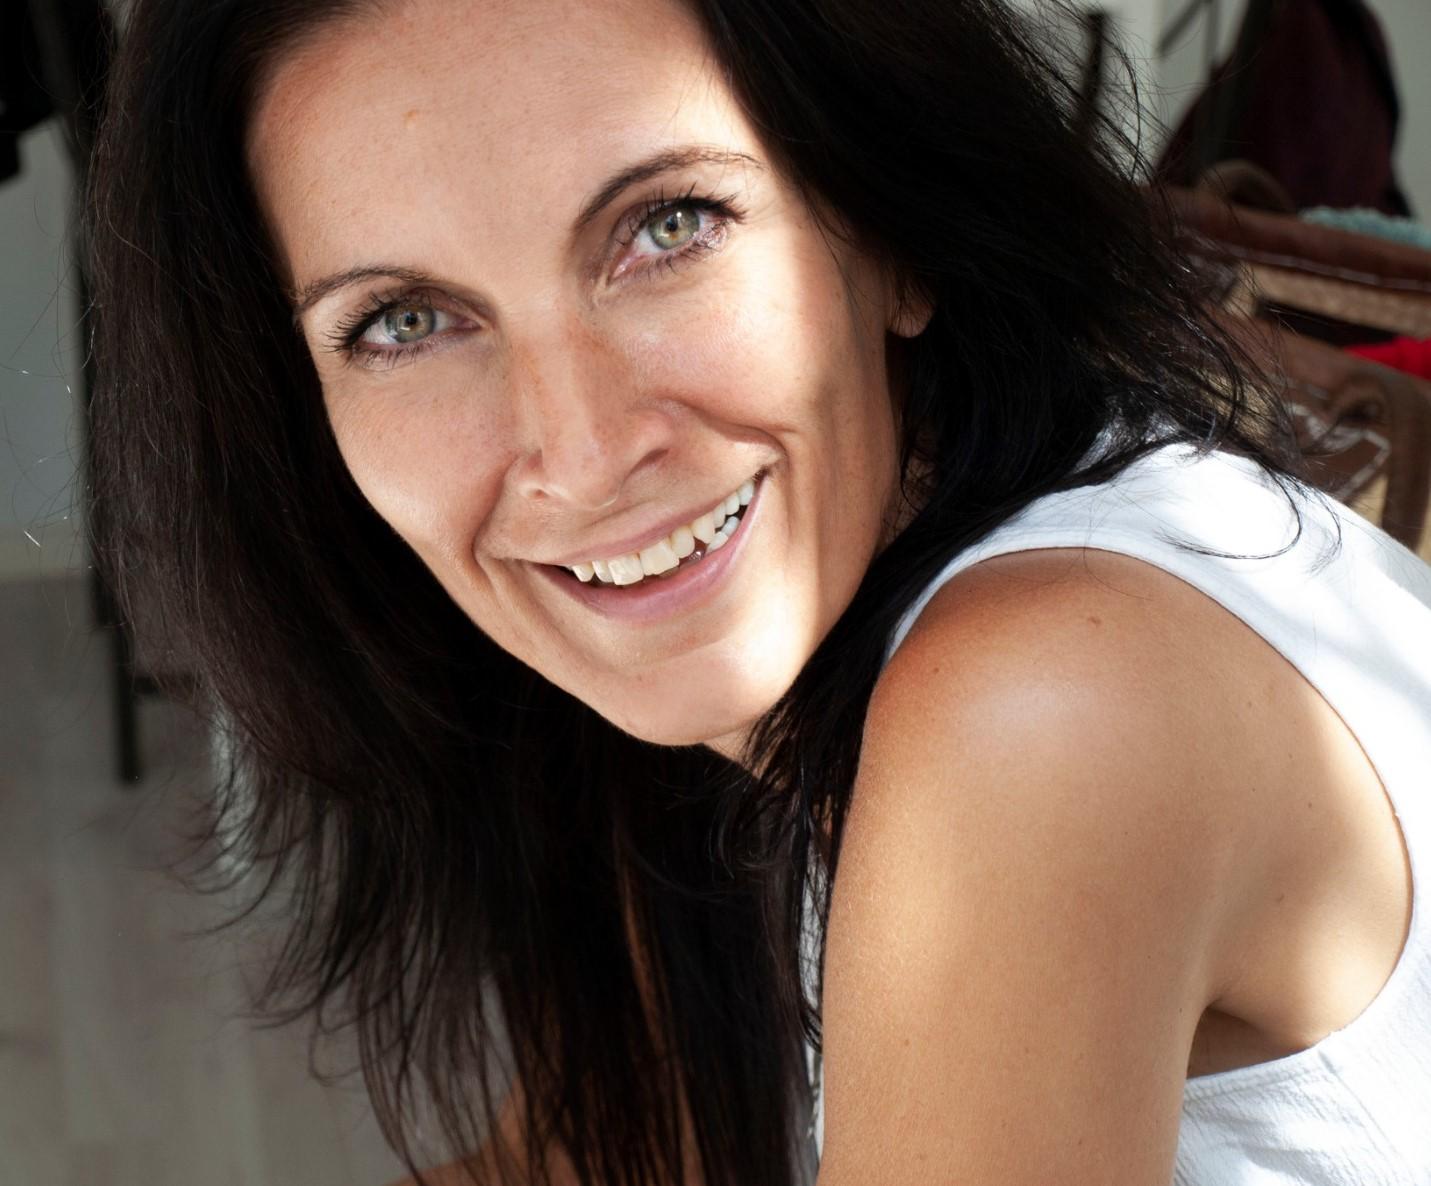 Heidi Gundel